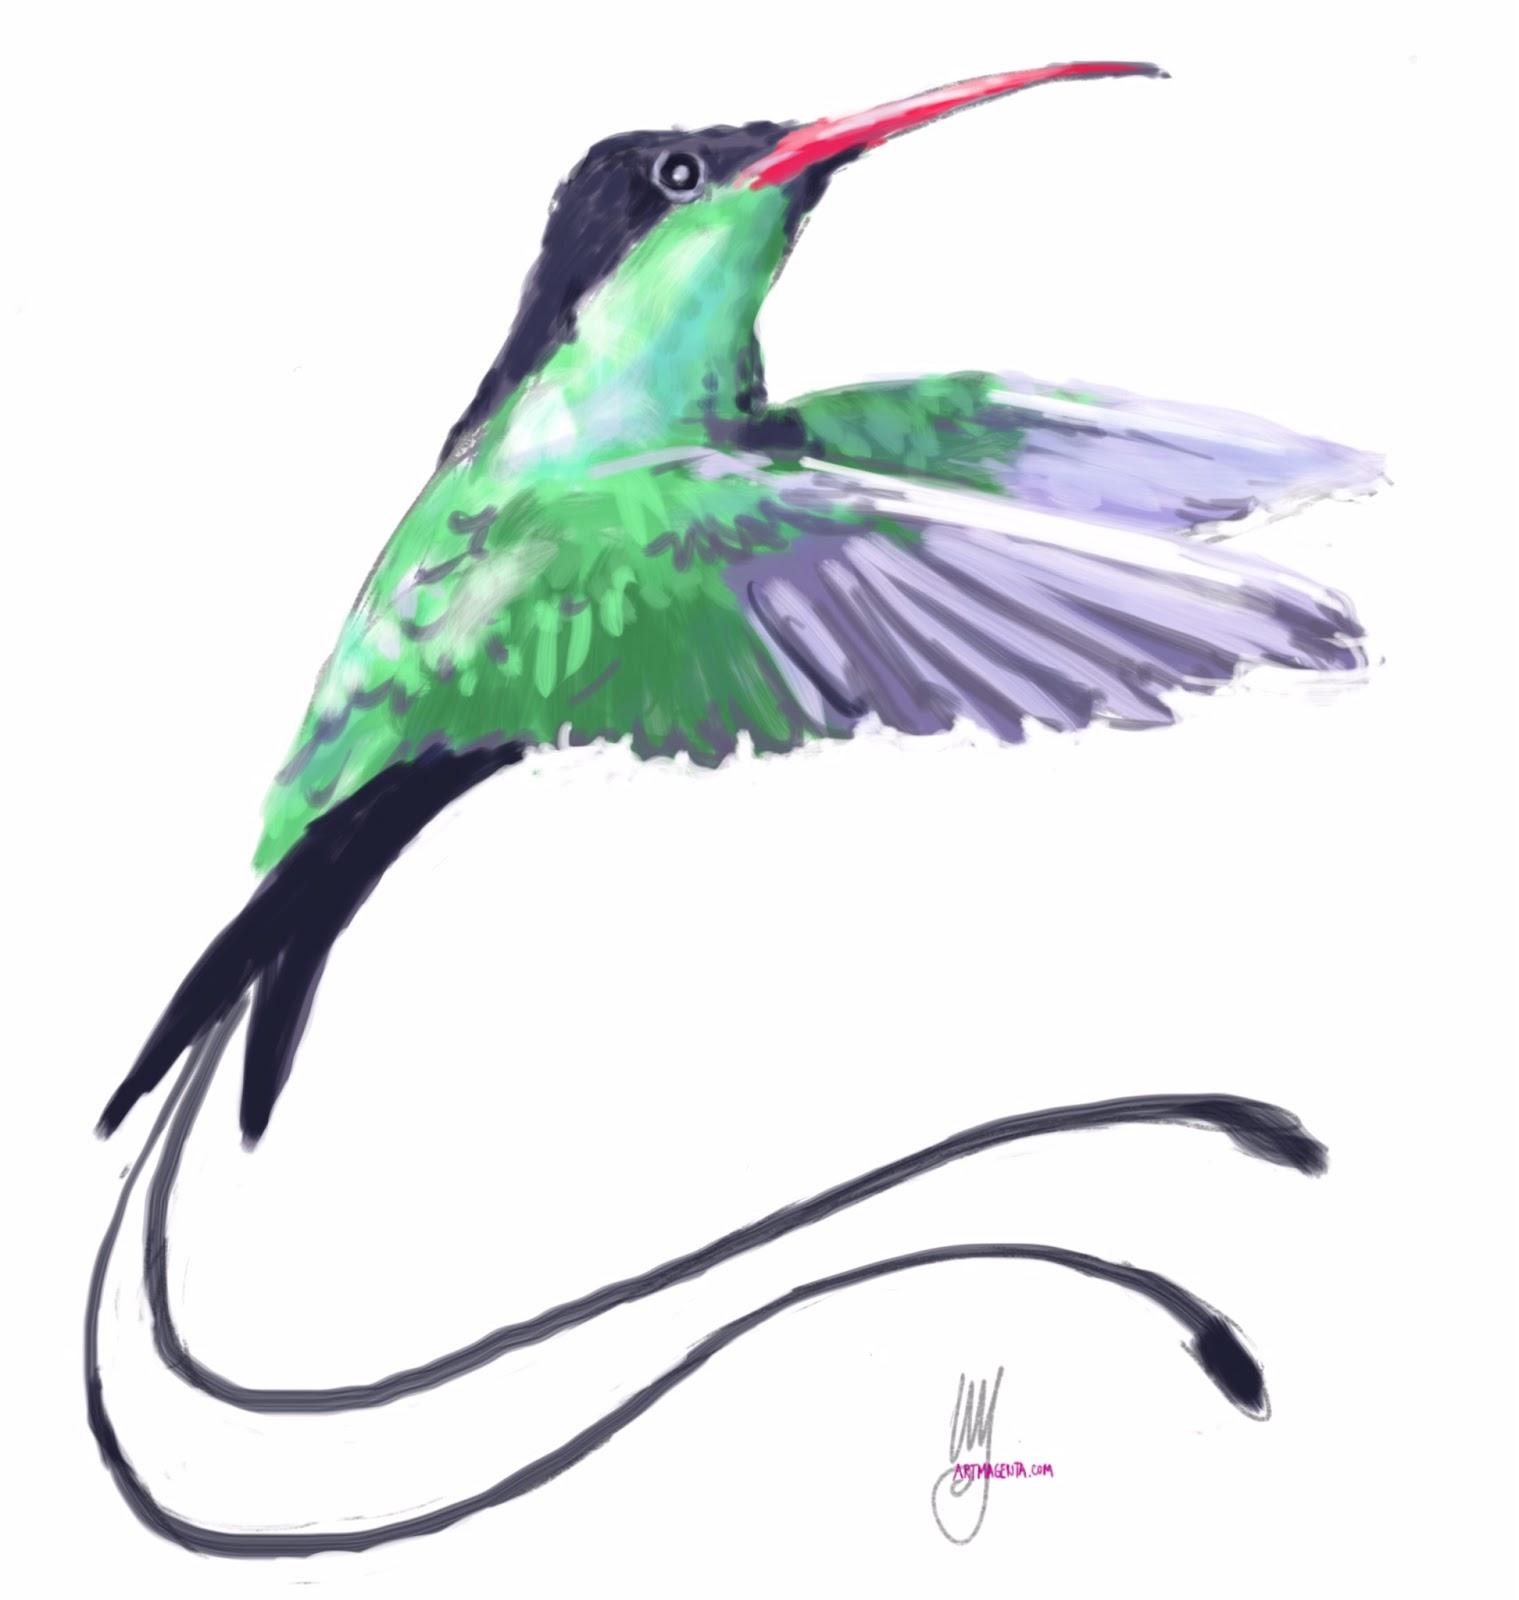 Red-billed streamertail sketch painting. Bird art drawing by illustrator Artmagenta